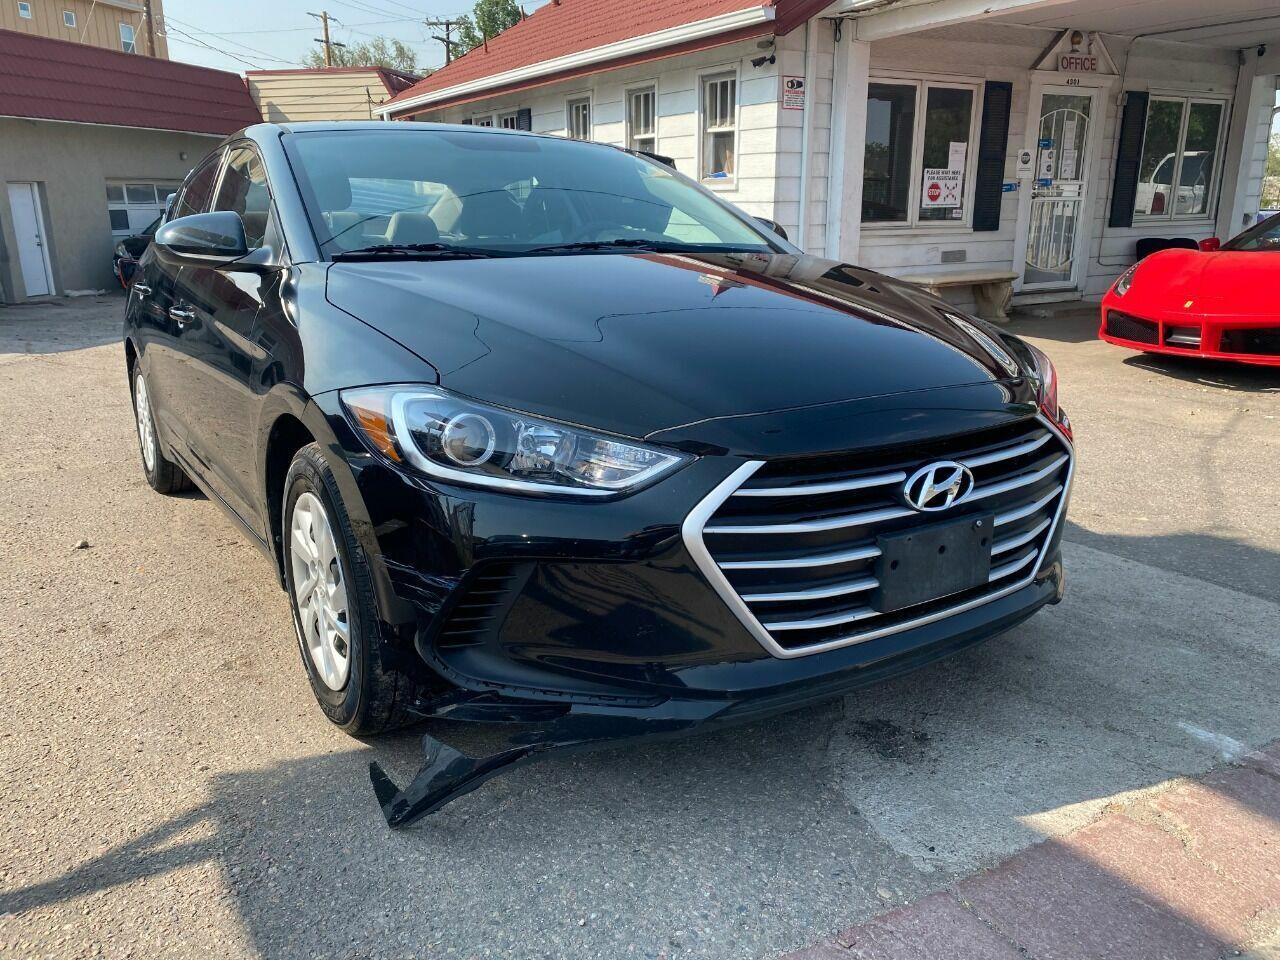 2018 Hyundai Elantra, Black with 40793 Miles available now!